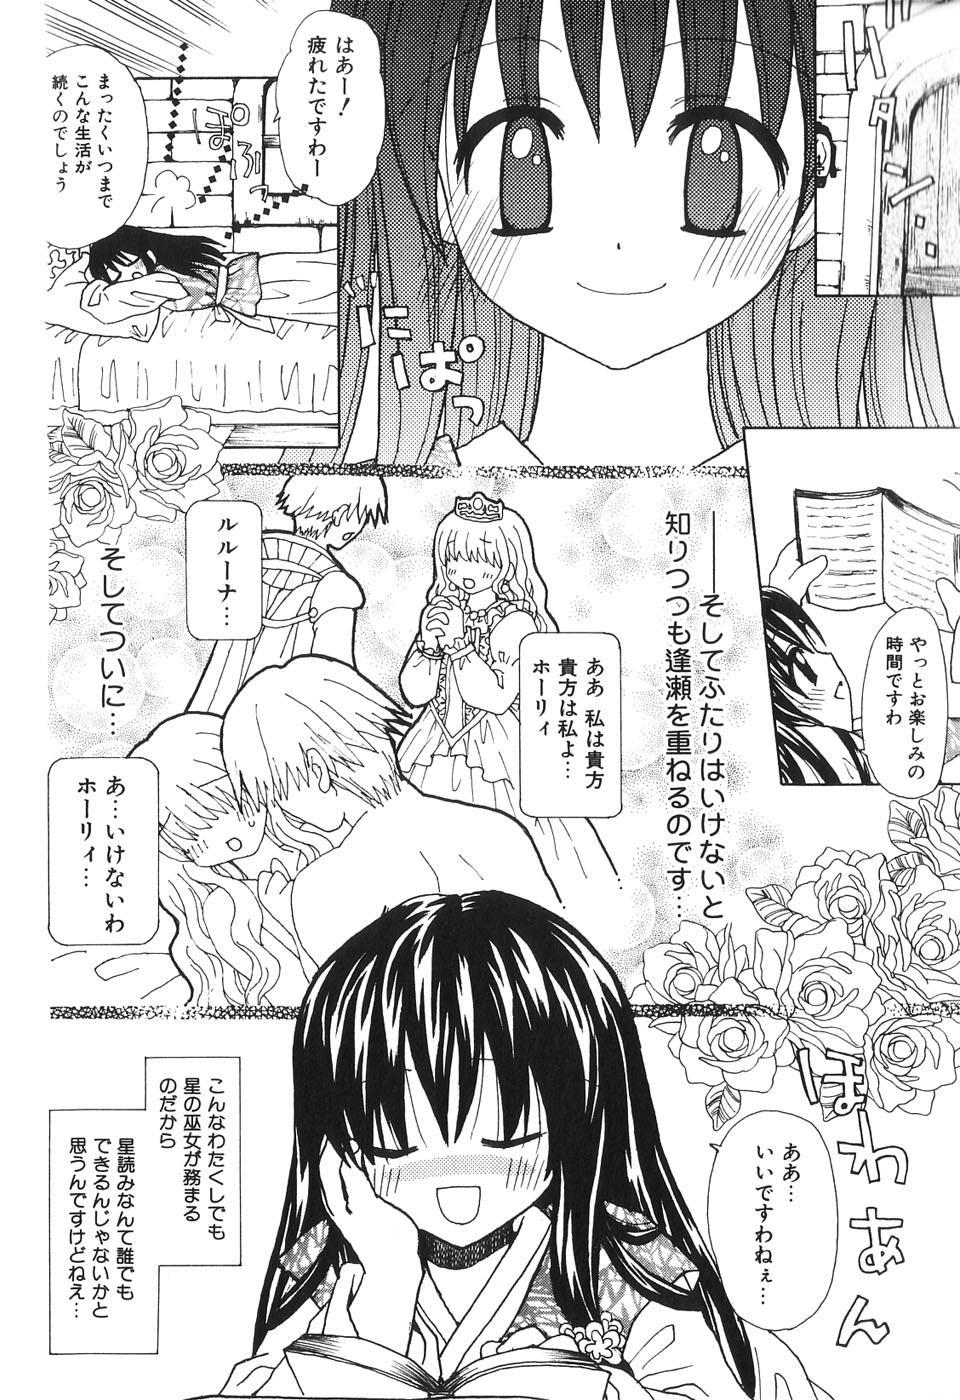 Musoubana 42